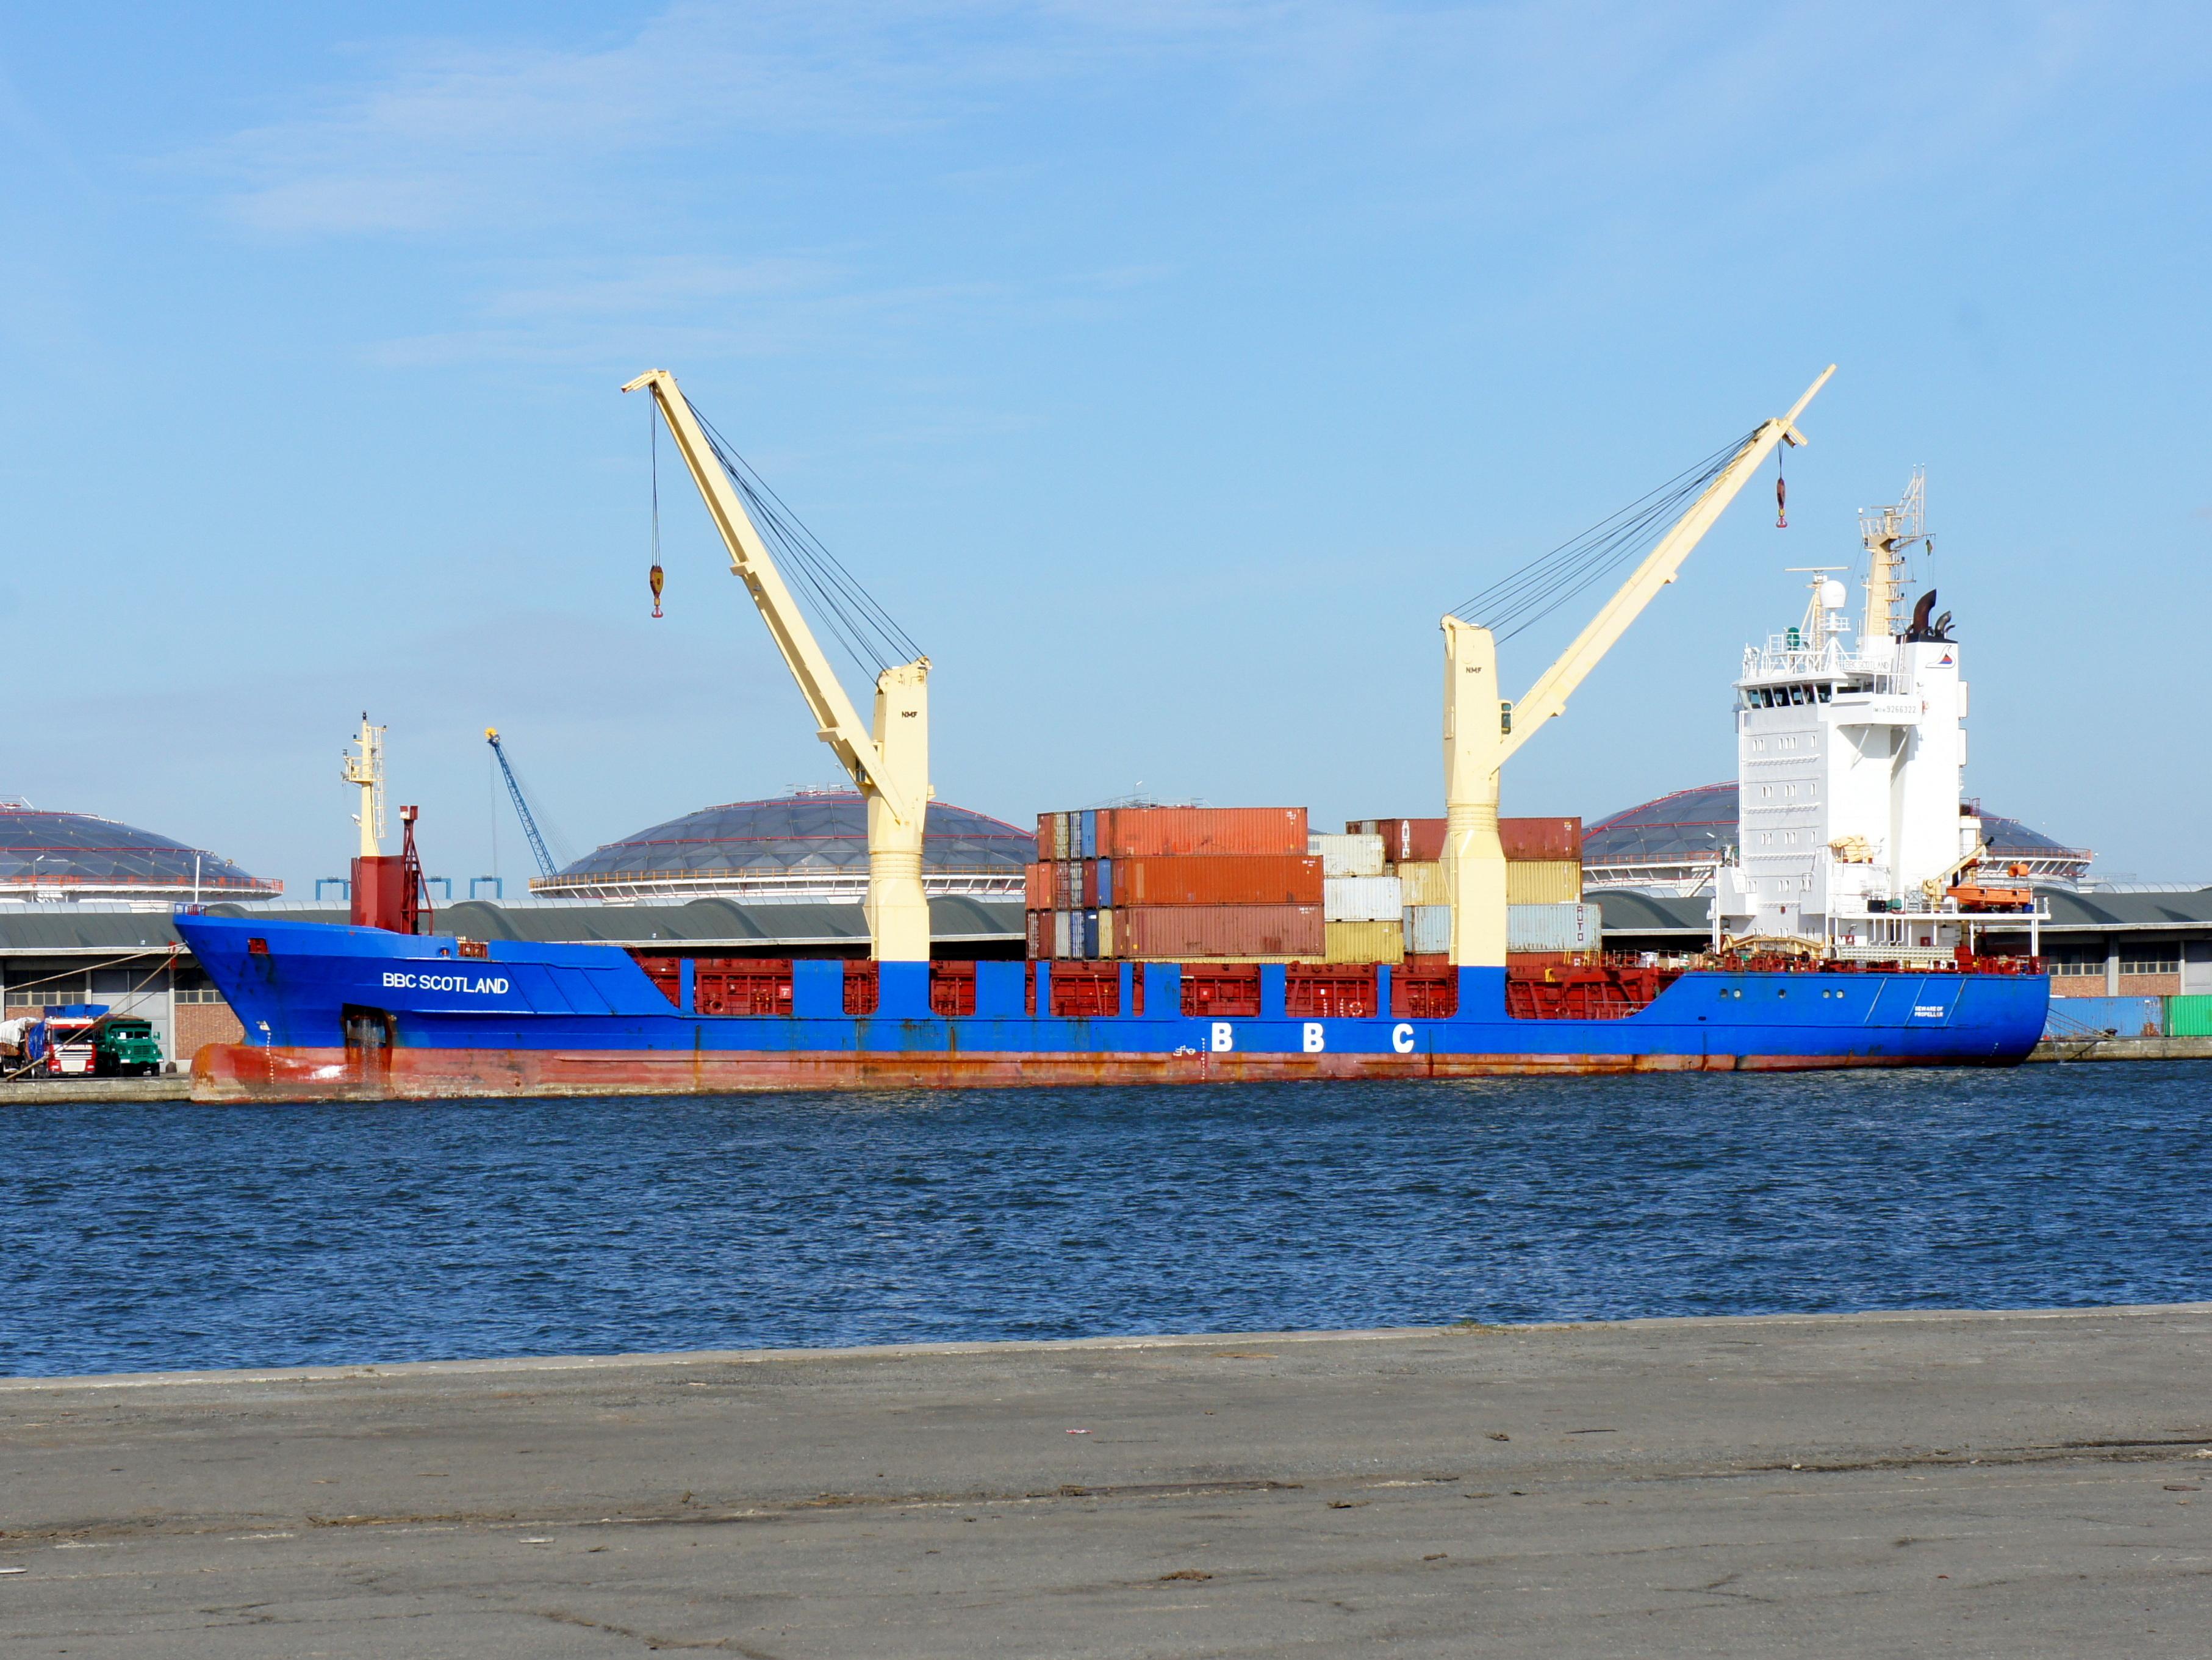 File:BBC Scotland - IMO 9266322 - Cargo Ship - Callsign